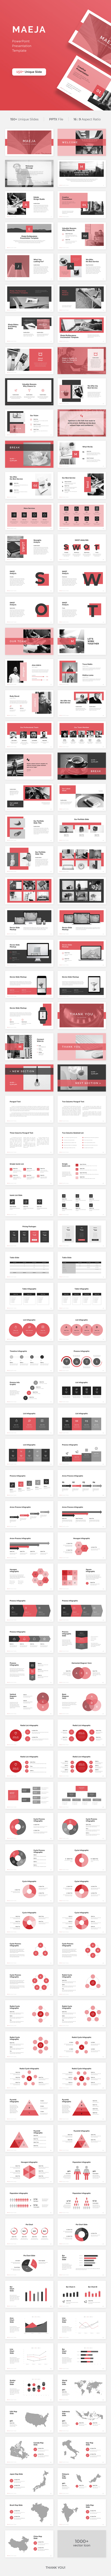 Maeja PowerPoint Presentation Template